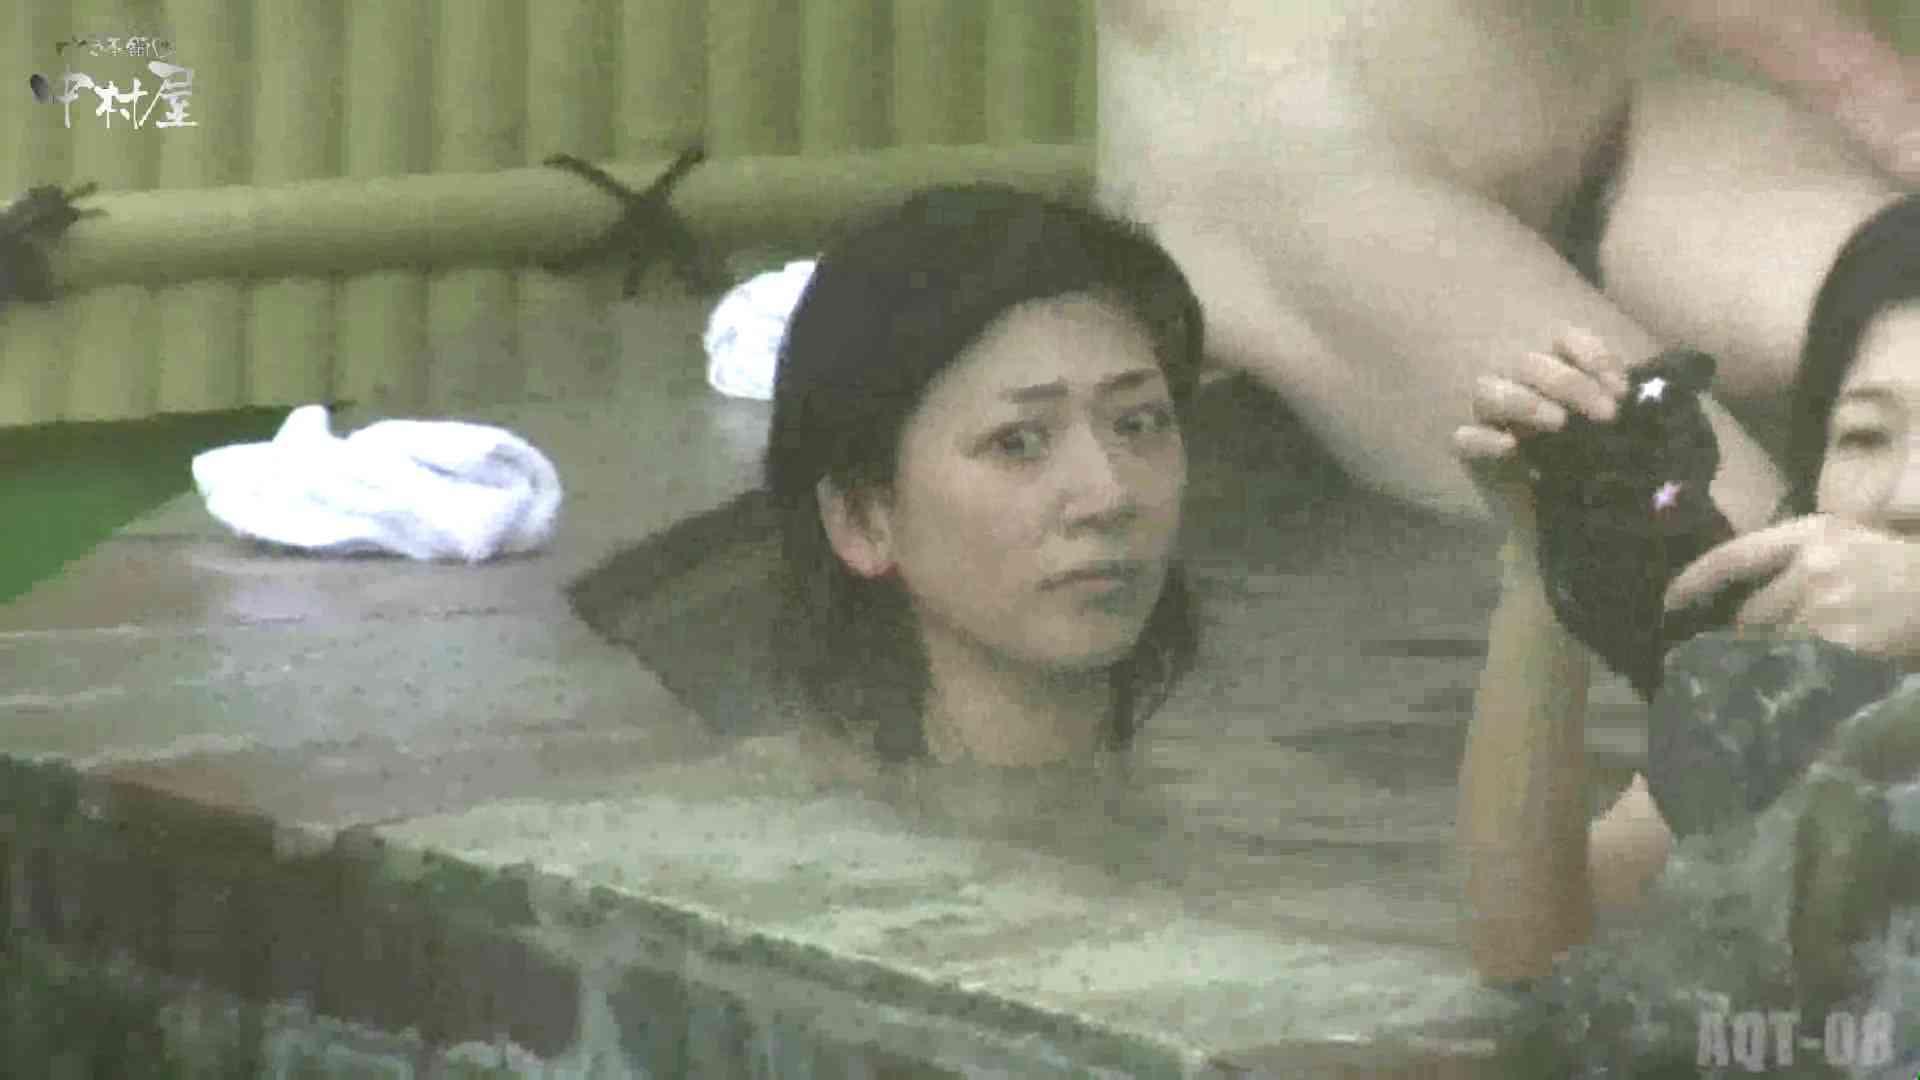 Aquaな露天風呂Vol.872潜入盗撮露天風呂八判湯 其の四 OL女体  92連発 28